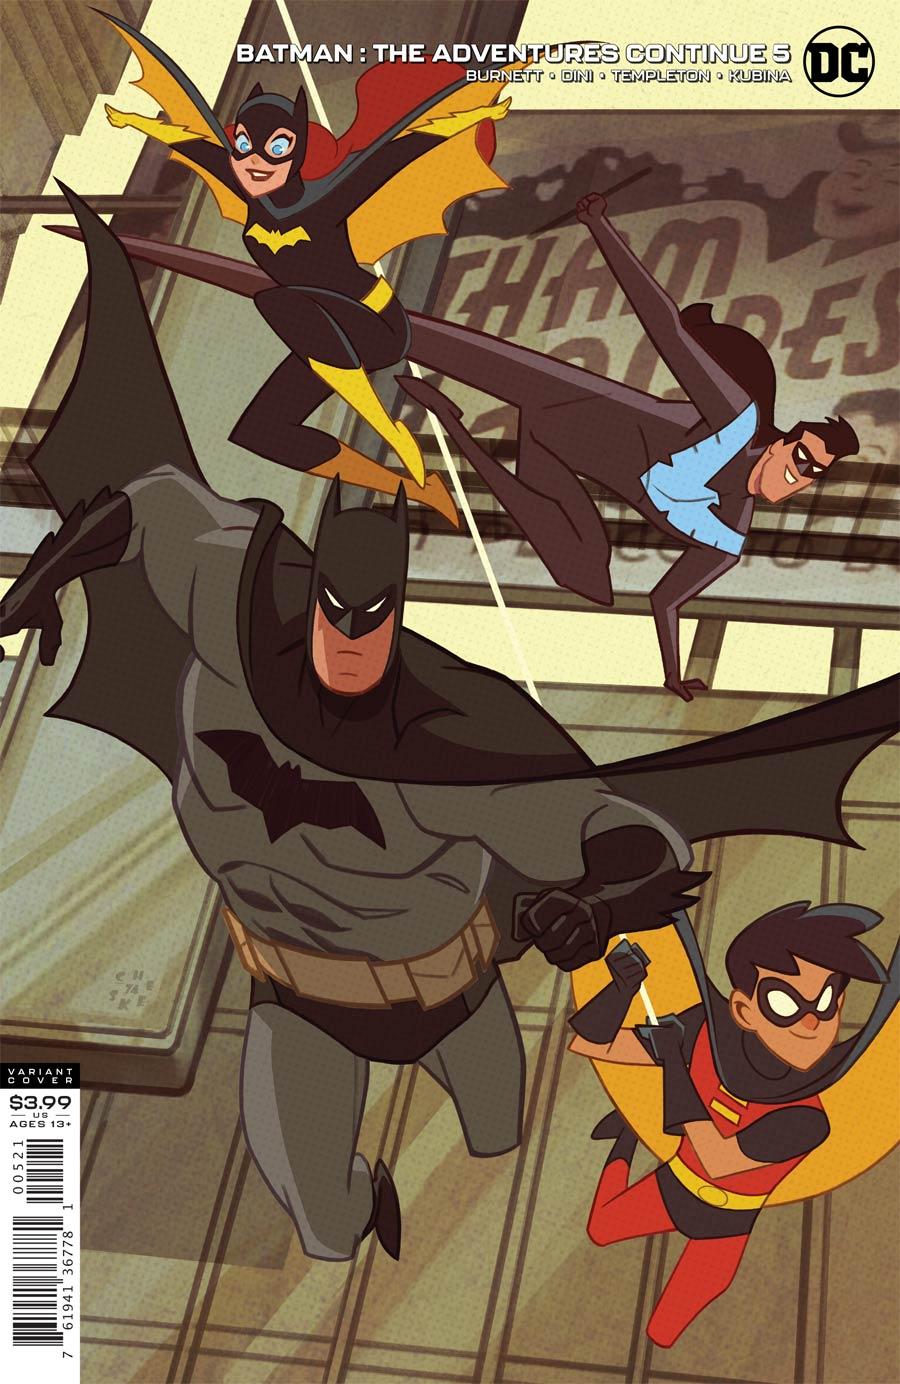 Batman The Adventures Continue #5 Cover B Variant Sean Cheeks Galloway Cover